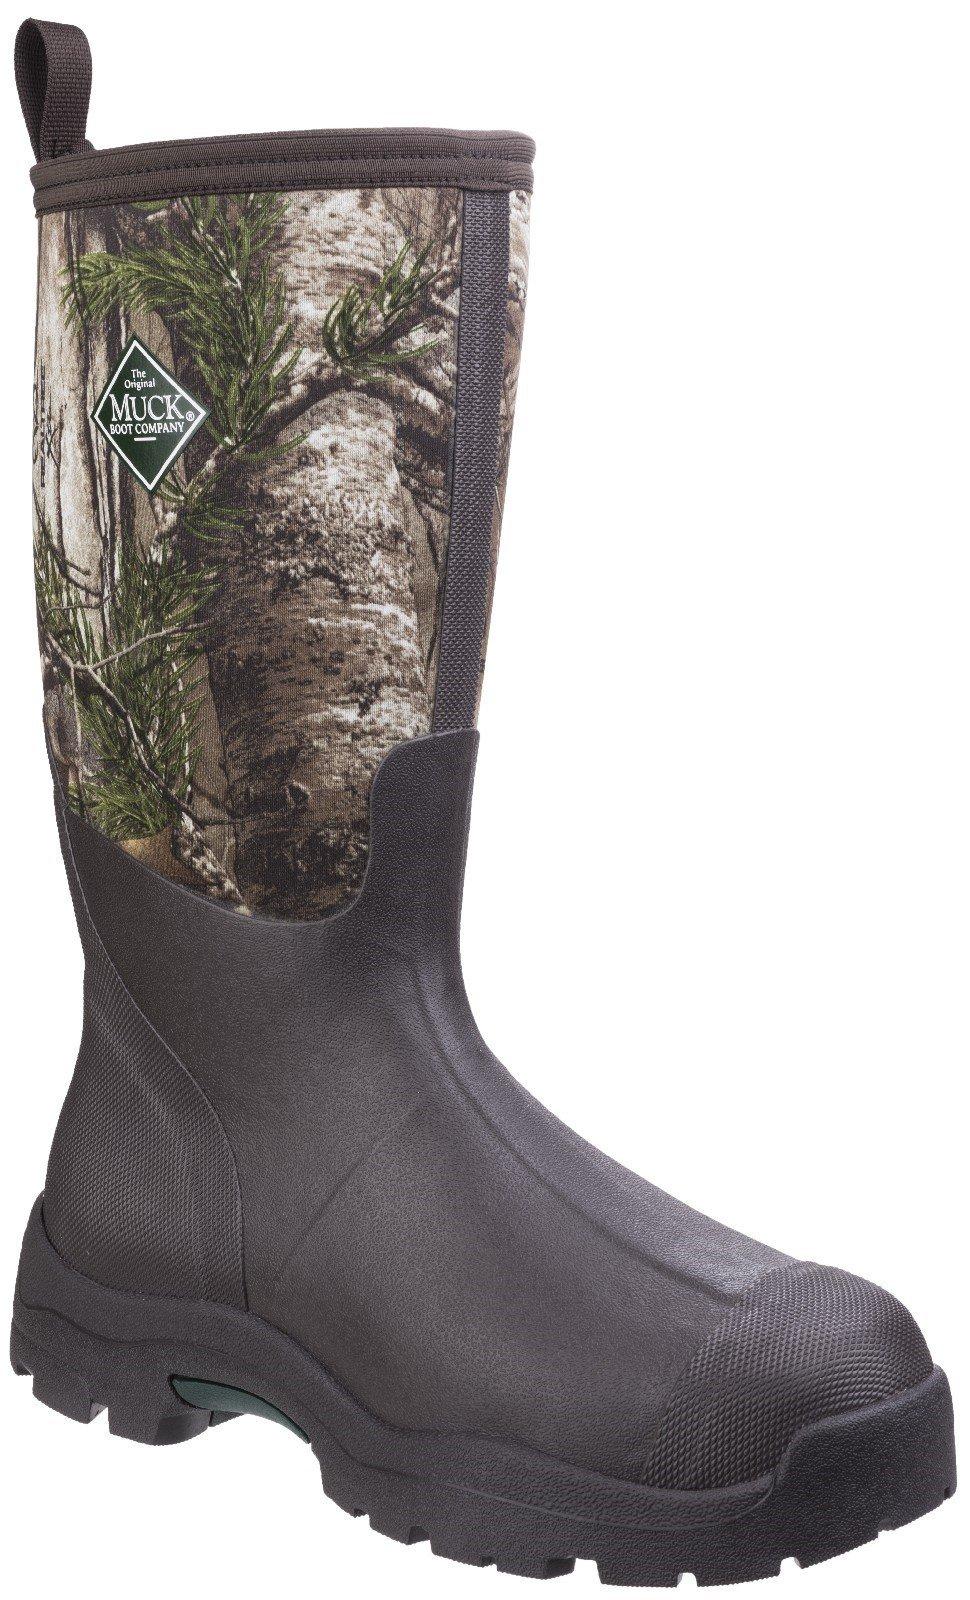 Muck Boots Unisex Derwent II All Purpose Field Boot Black 25888 - Black/Bark 4